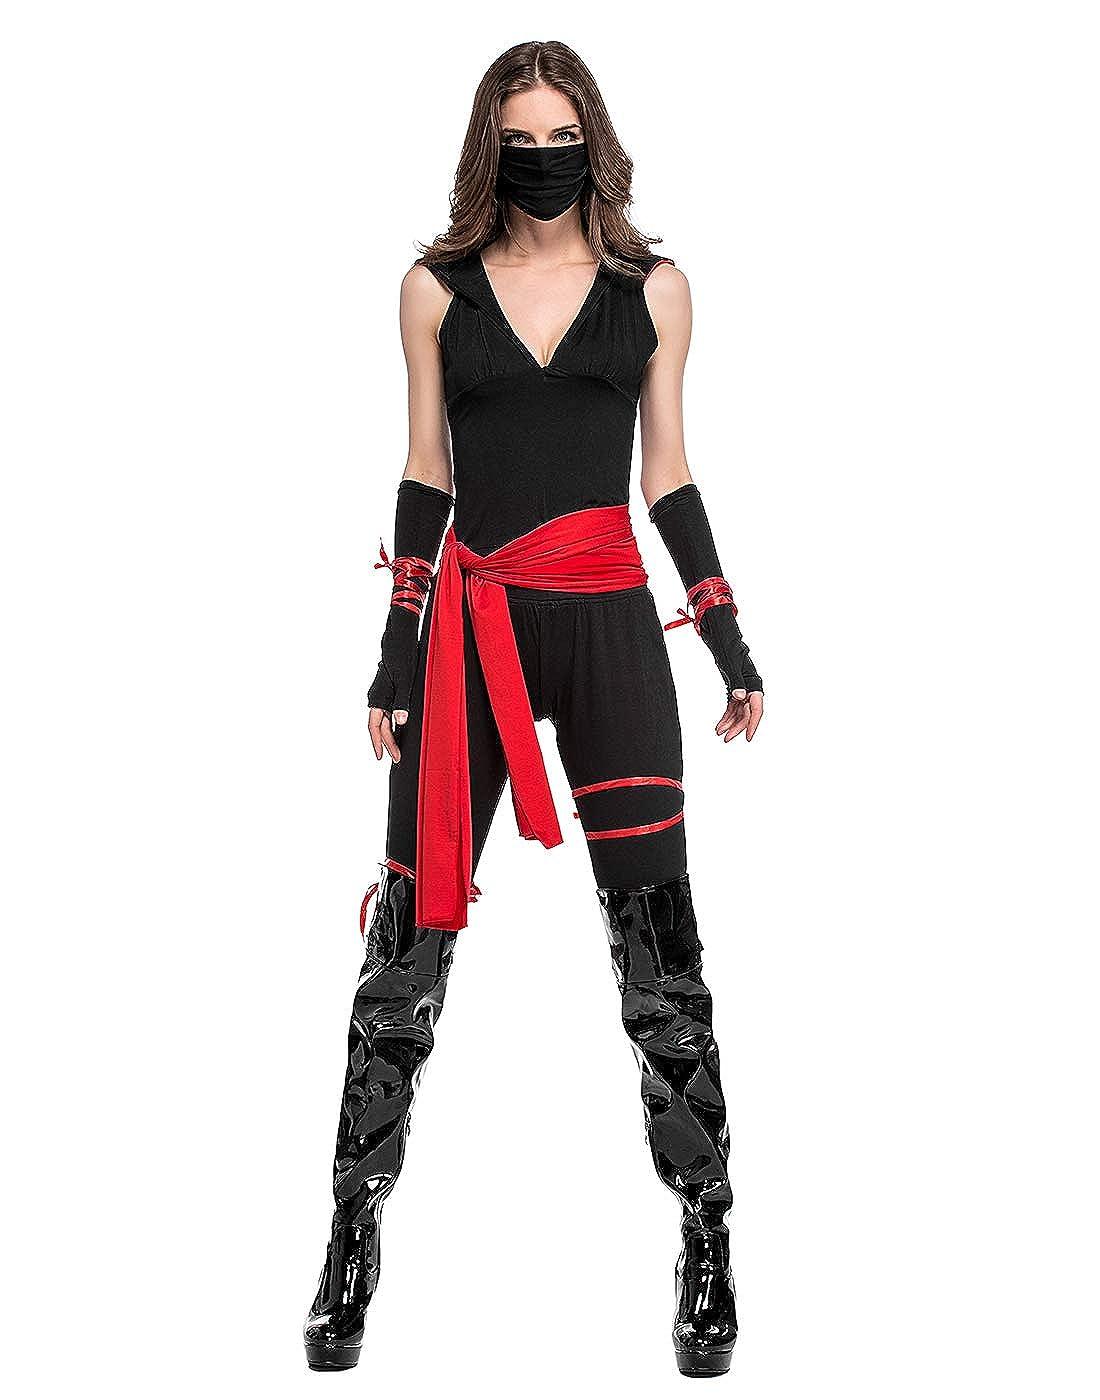 Amazon.com: HDE - Disfraz de mujer Ninja Halloween, para ...